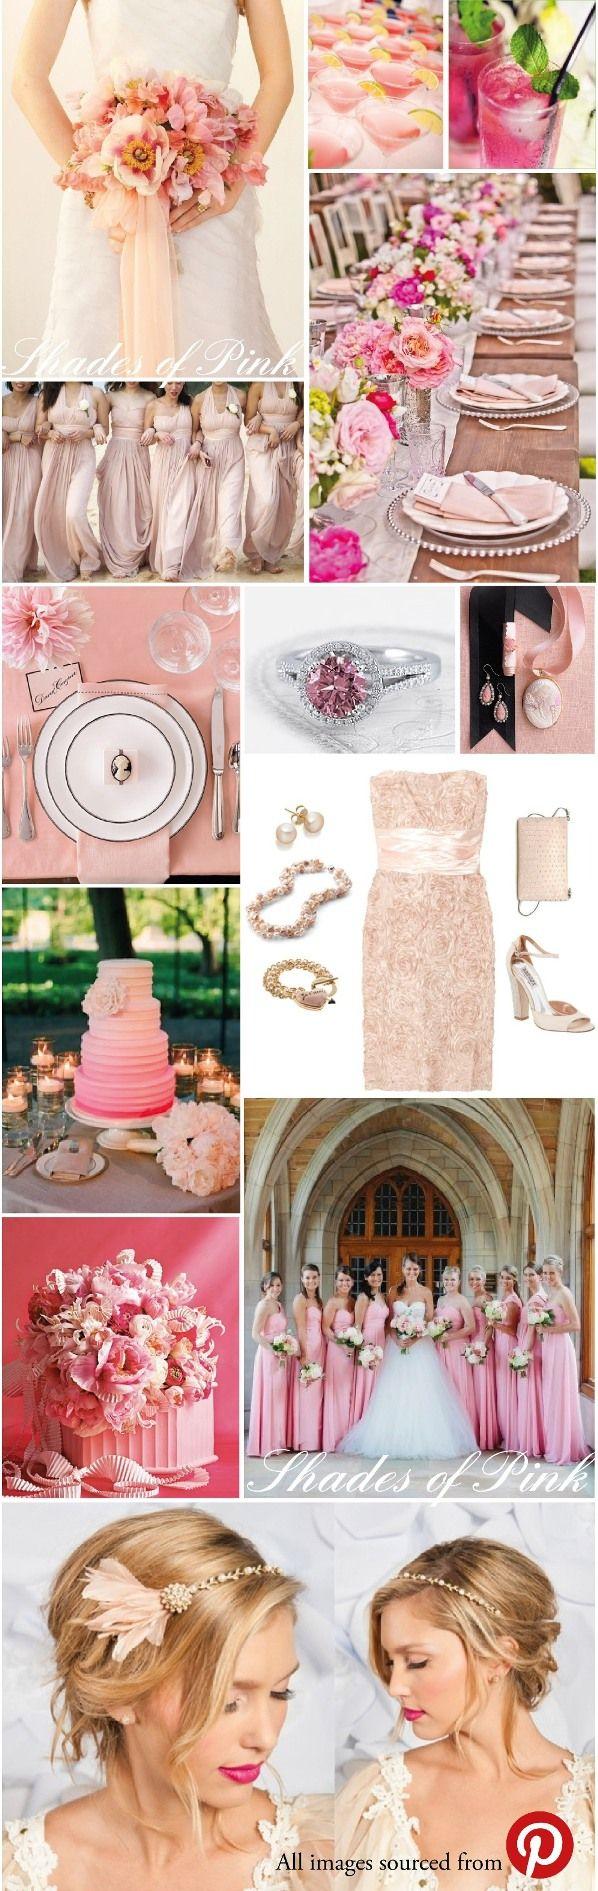 Pink Inspired Wedding Ideas